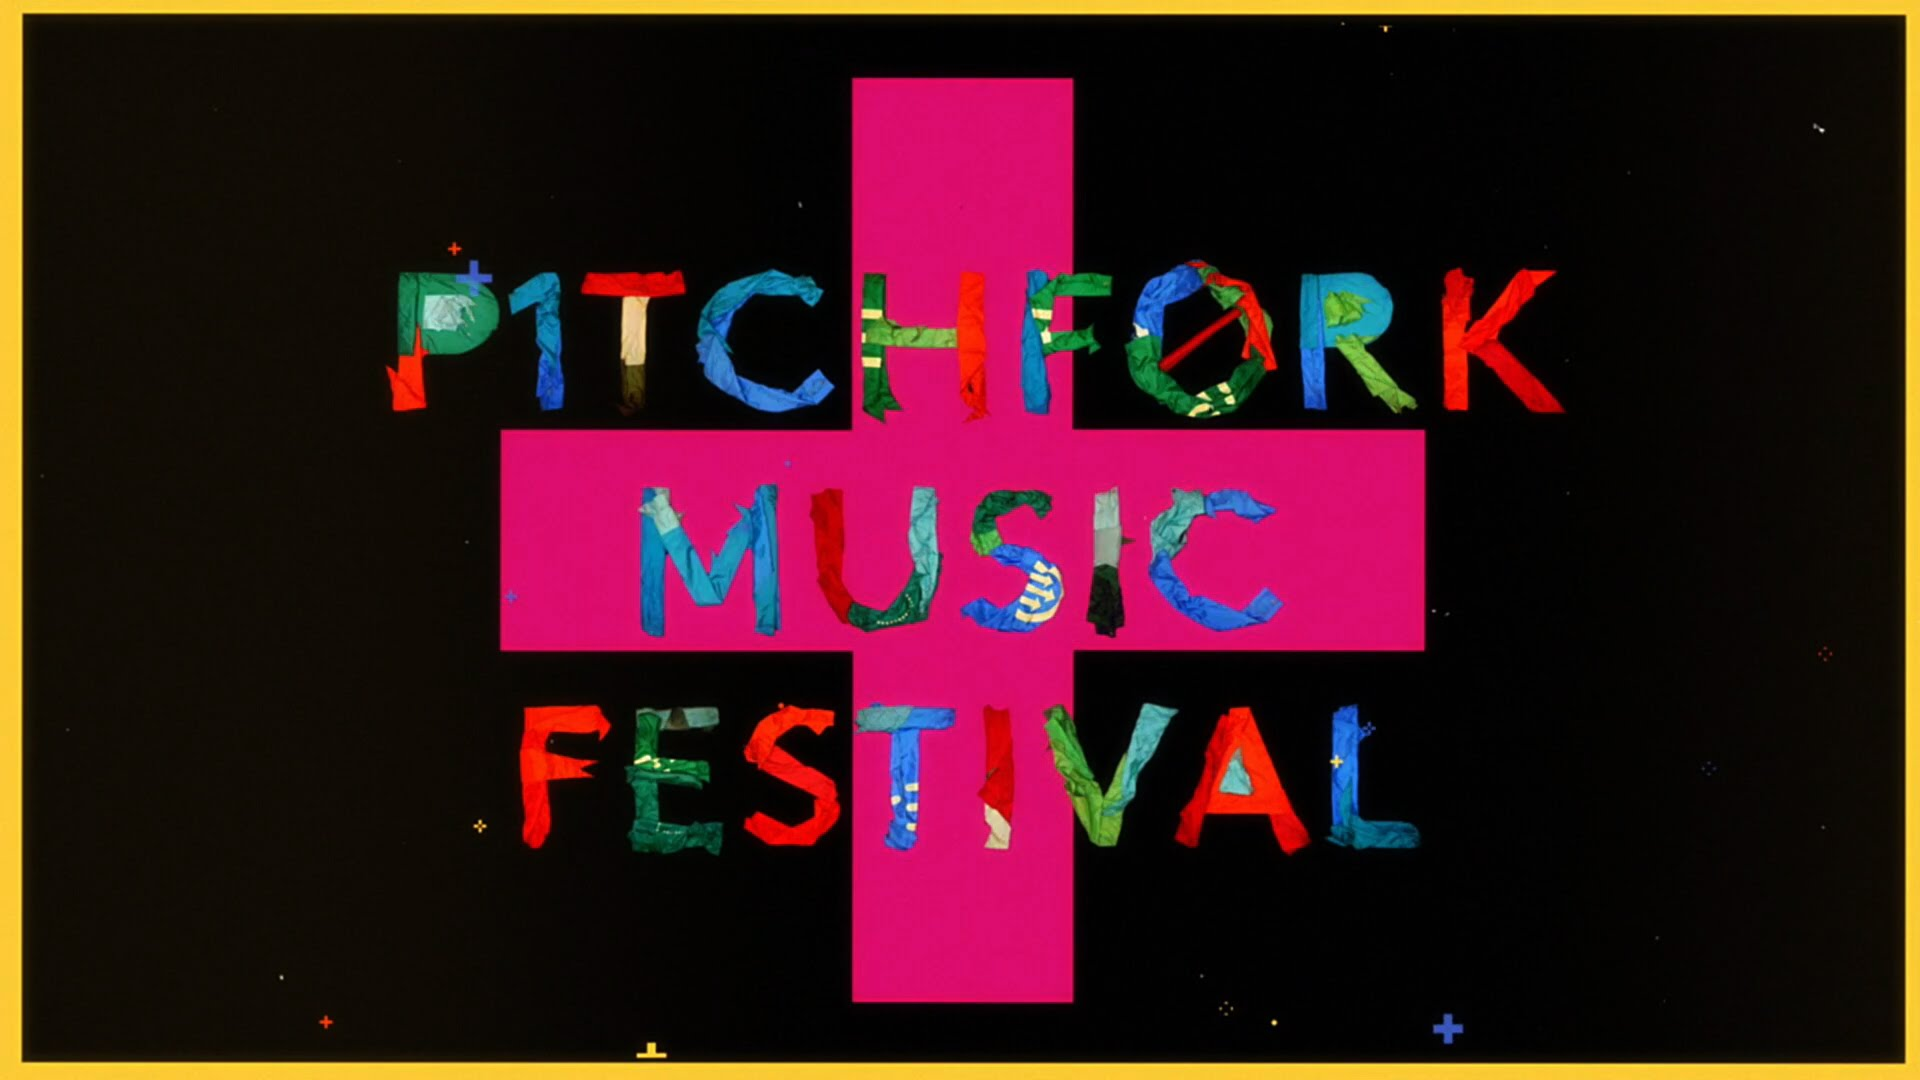 pitchfork festival promo code